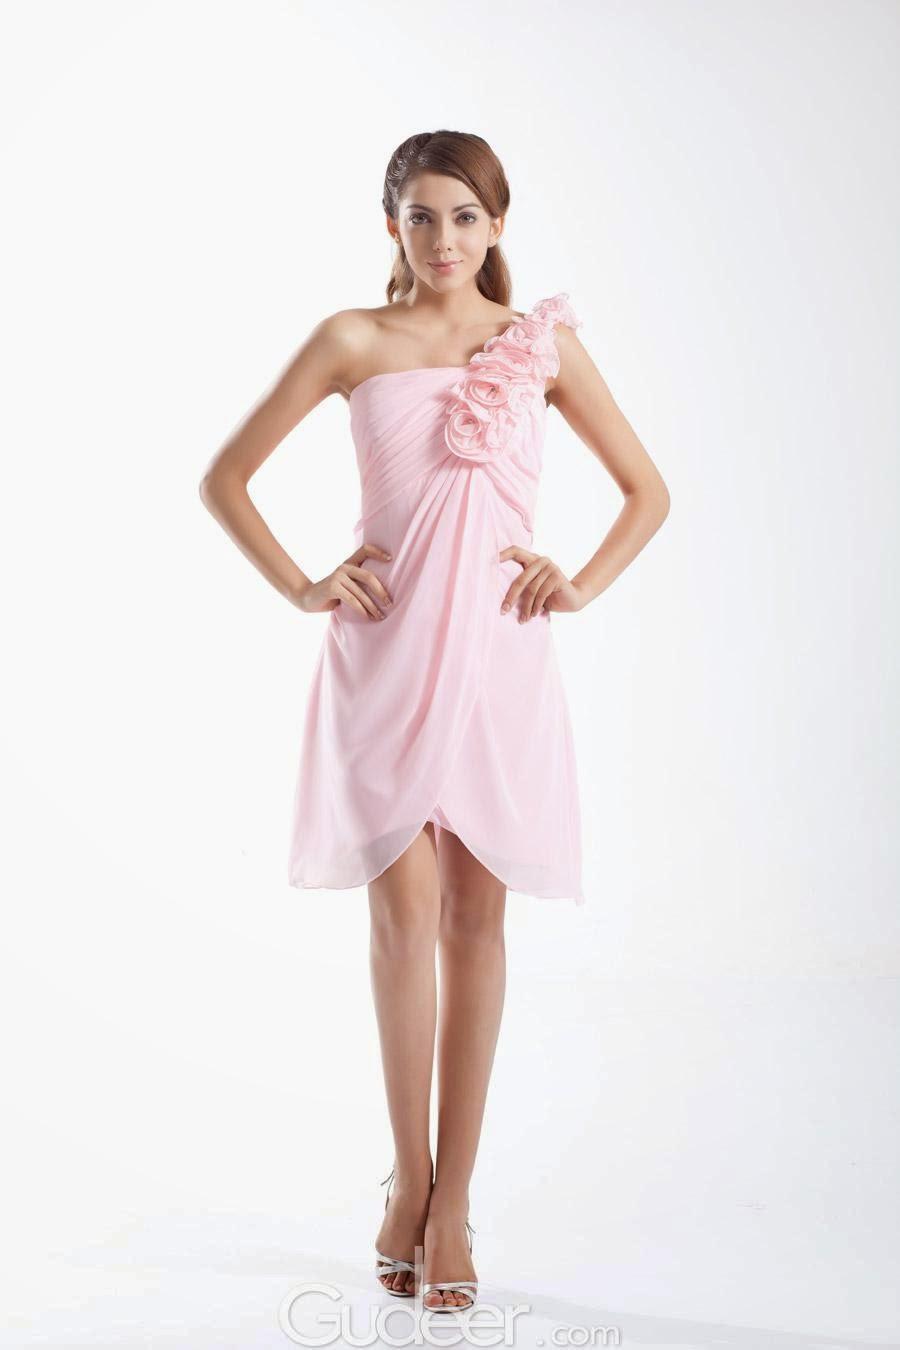 The gudeer bride short bridesmaid dresses 2015 collection light pink chiffon flowers one shoulder short bridesmaid dress ombrellifo Gallery